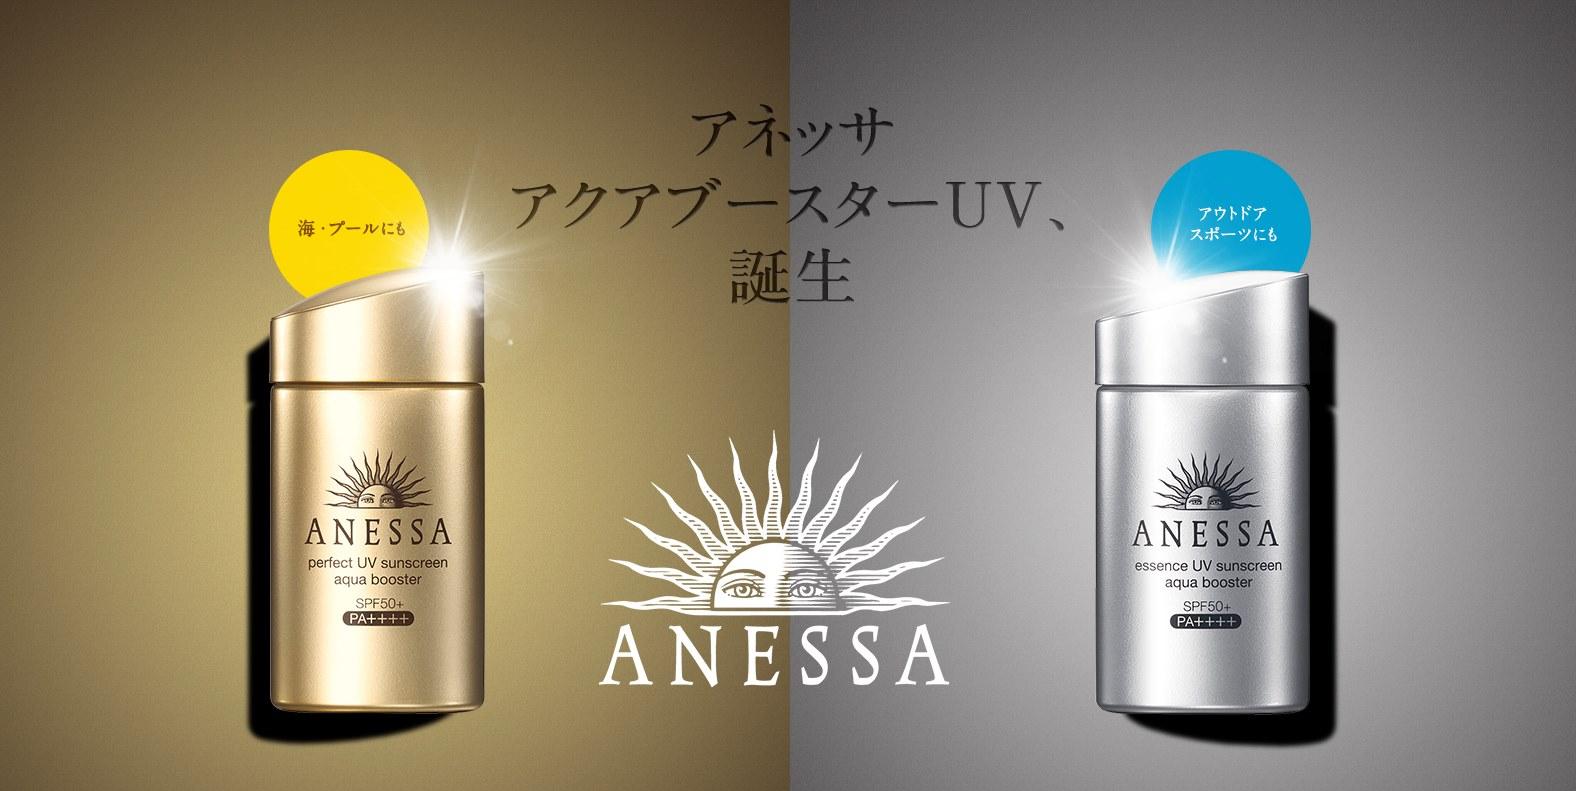 Kem chống nắng Anessa Shiseido